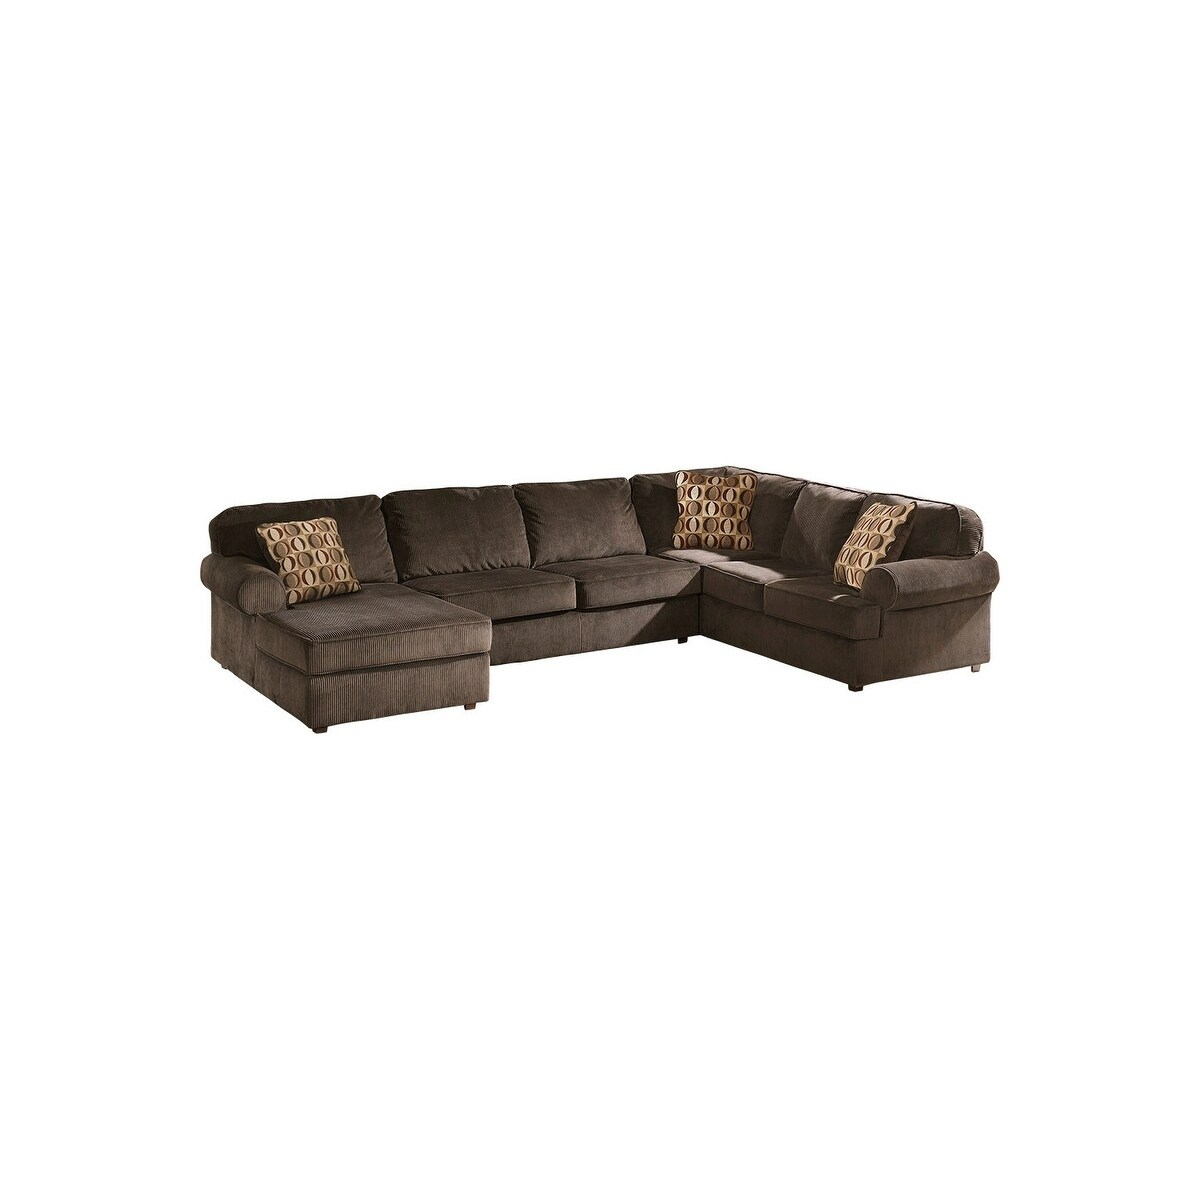 Vista Armless Loveseat Left-arm Corner Chaise Right-arm Sofa 3-piece  Sectional